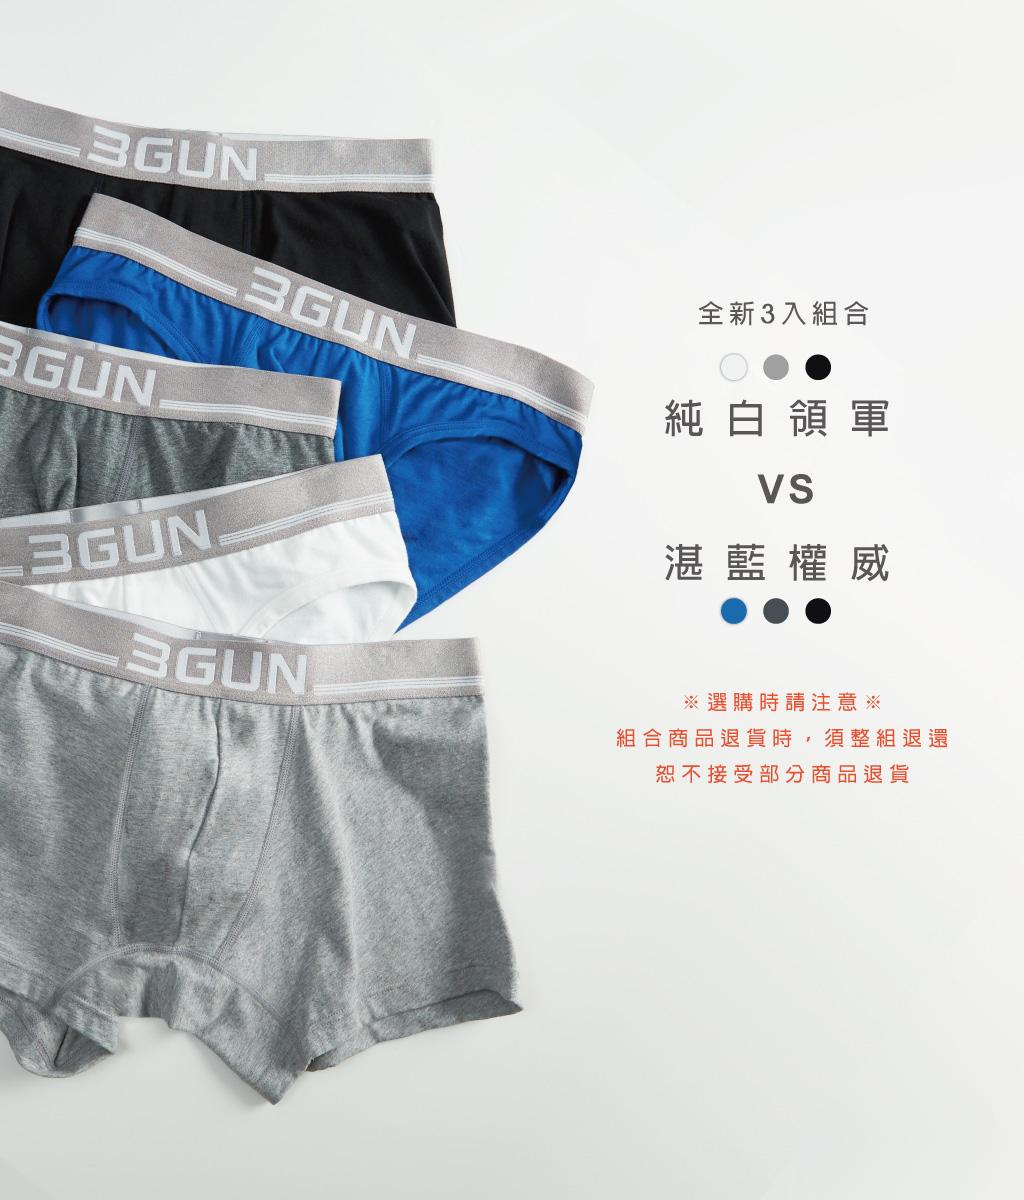 3GUN |男性時尚內衣褲MIT品牌-棉感-超值3入男彈力棉平口褲組